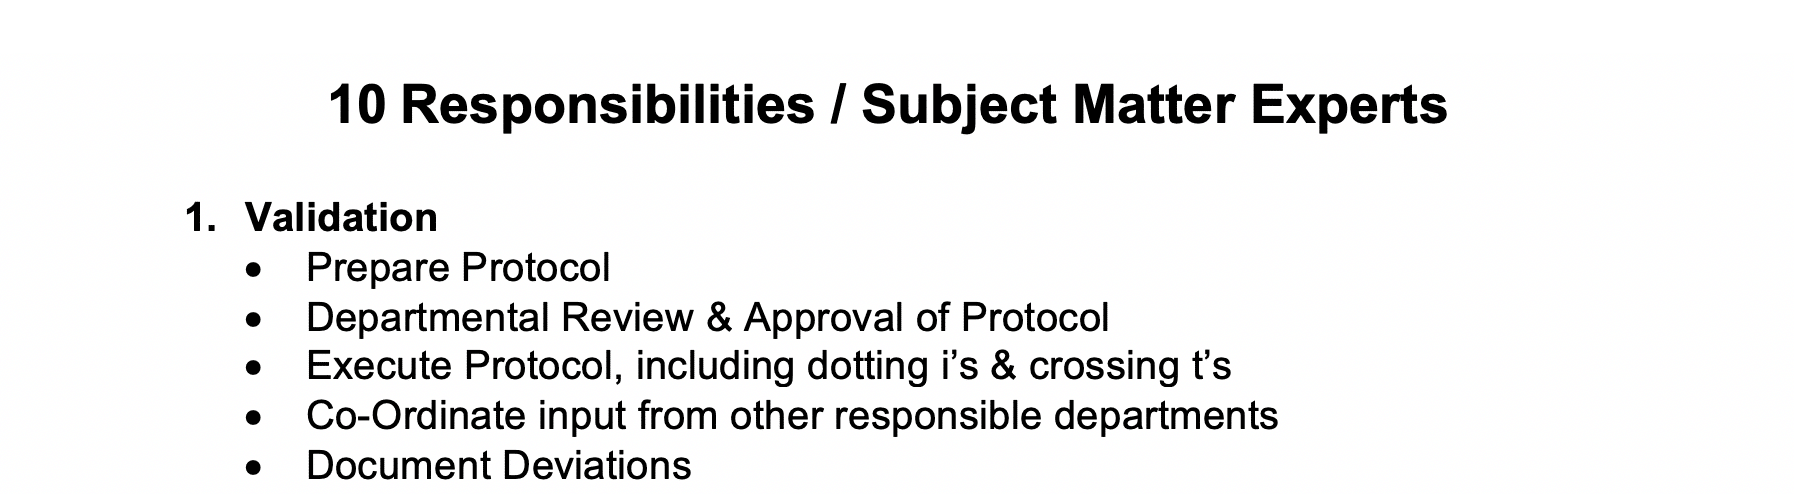 Responsibilities / Subject-Matter Experts GetReskilled